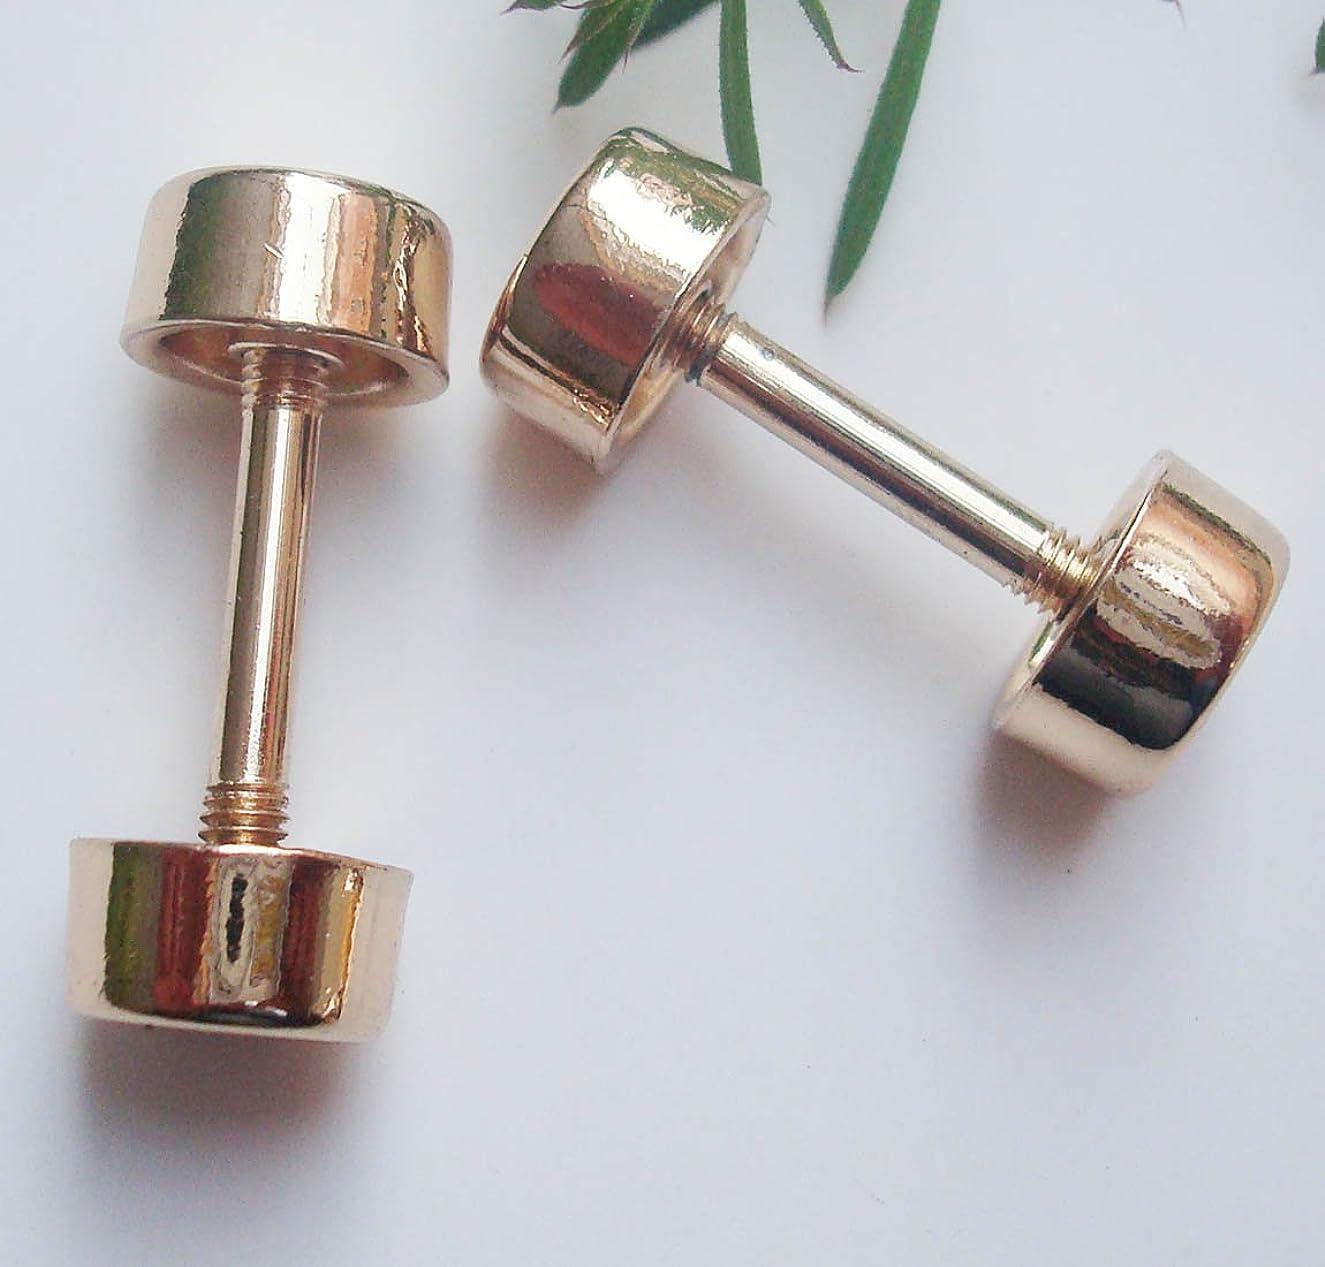 4pcs DIY bag buckle wheel buckle Leathercraft Rivets screws for handbag,handbag repair sewing metalware barbell buckle garment accessories (20mm, gold)